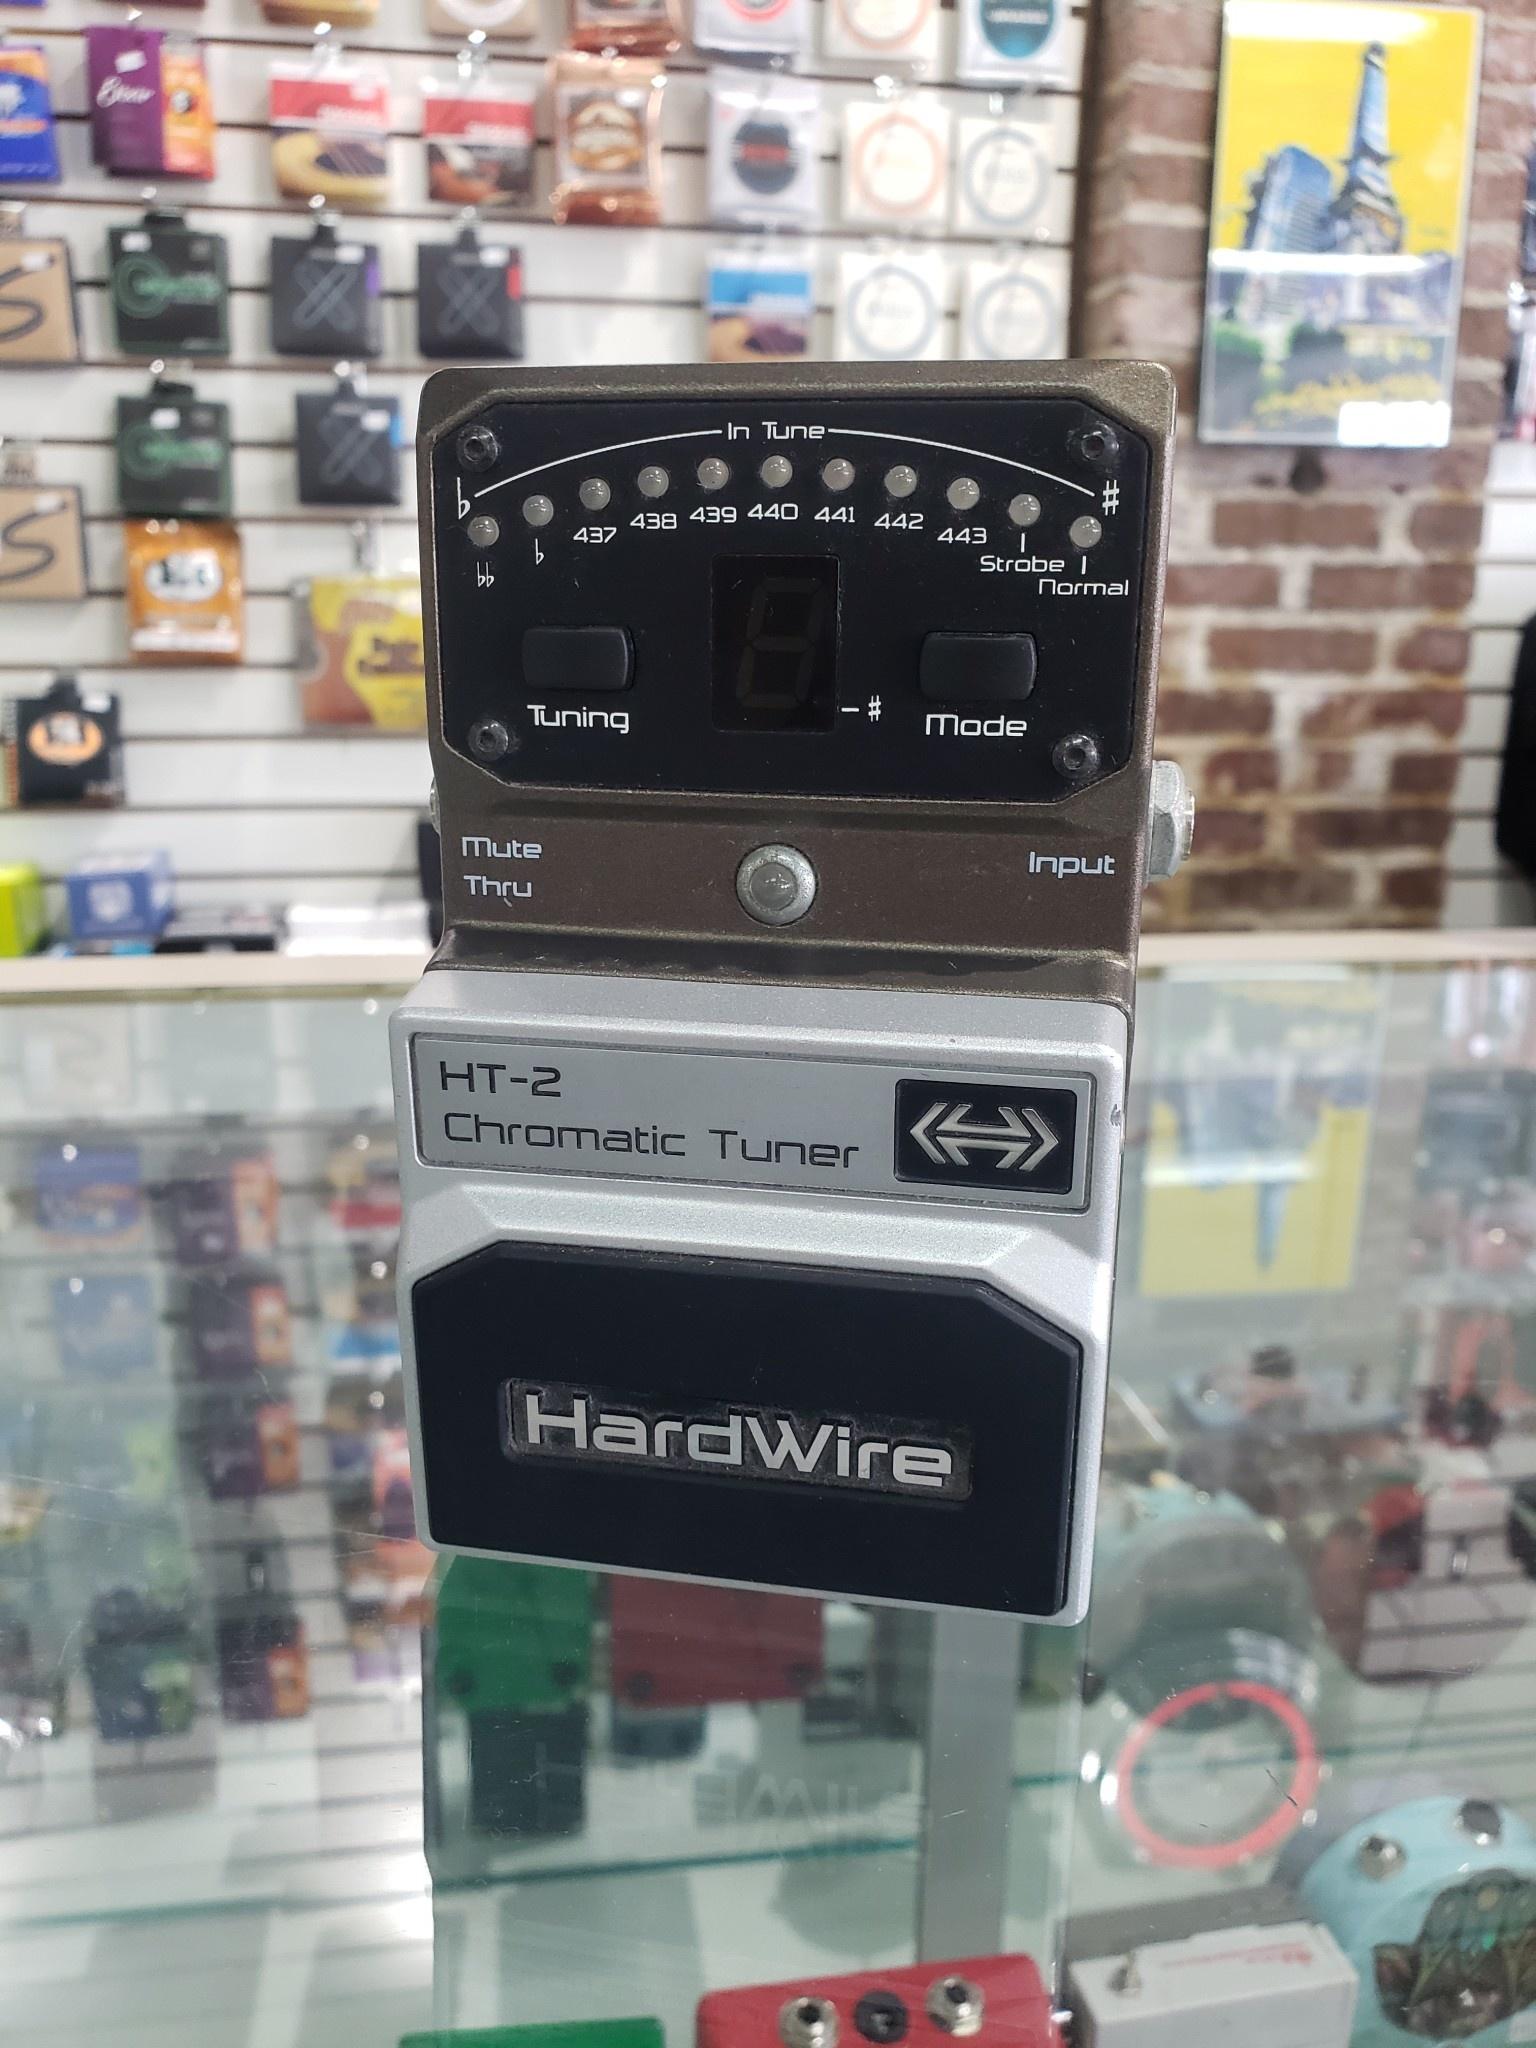 HardWire HT-2 Chromatic Tuner-1